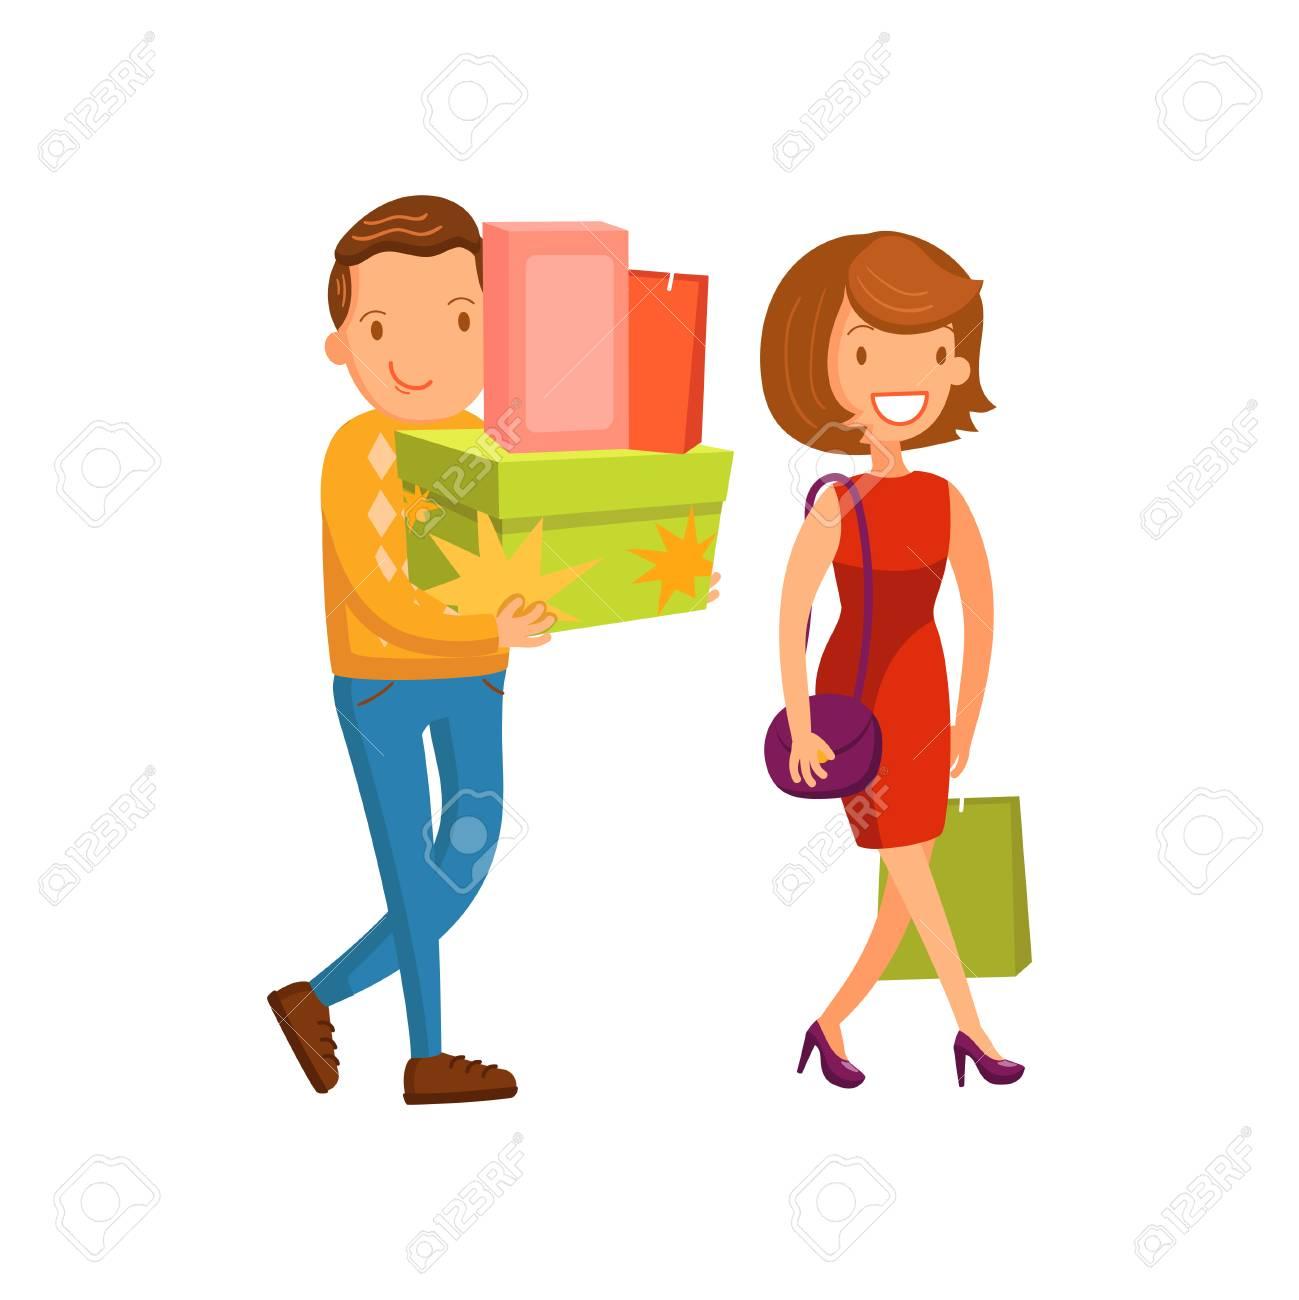 Dessin Shopping happy couple shopping, family shopping in a mall cartoon vector